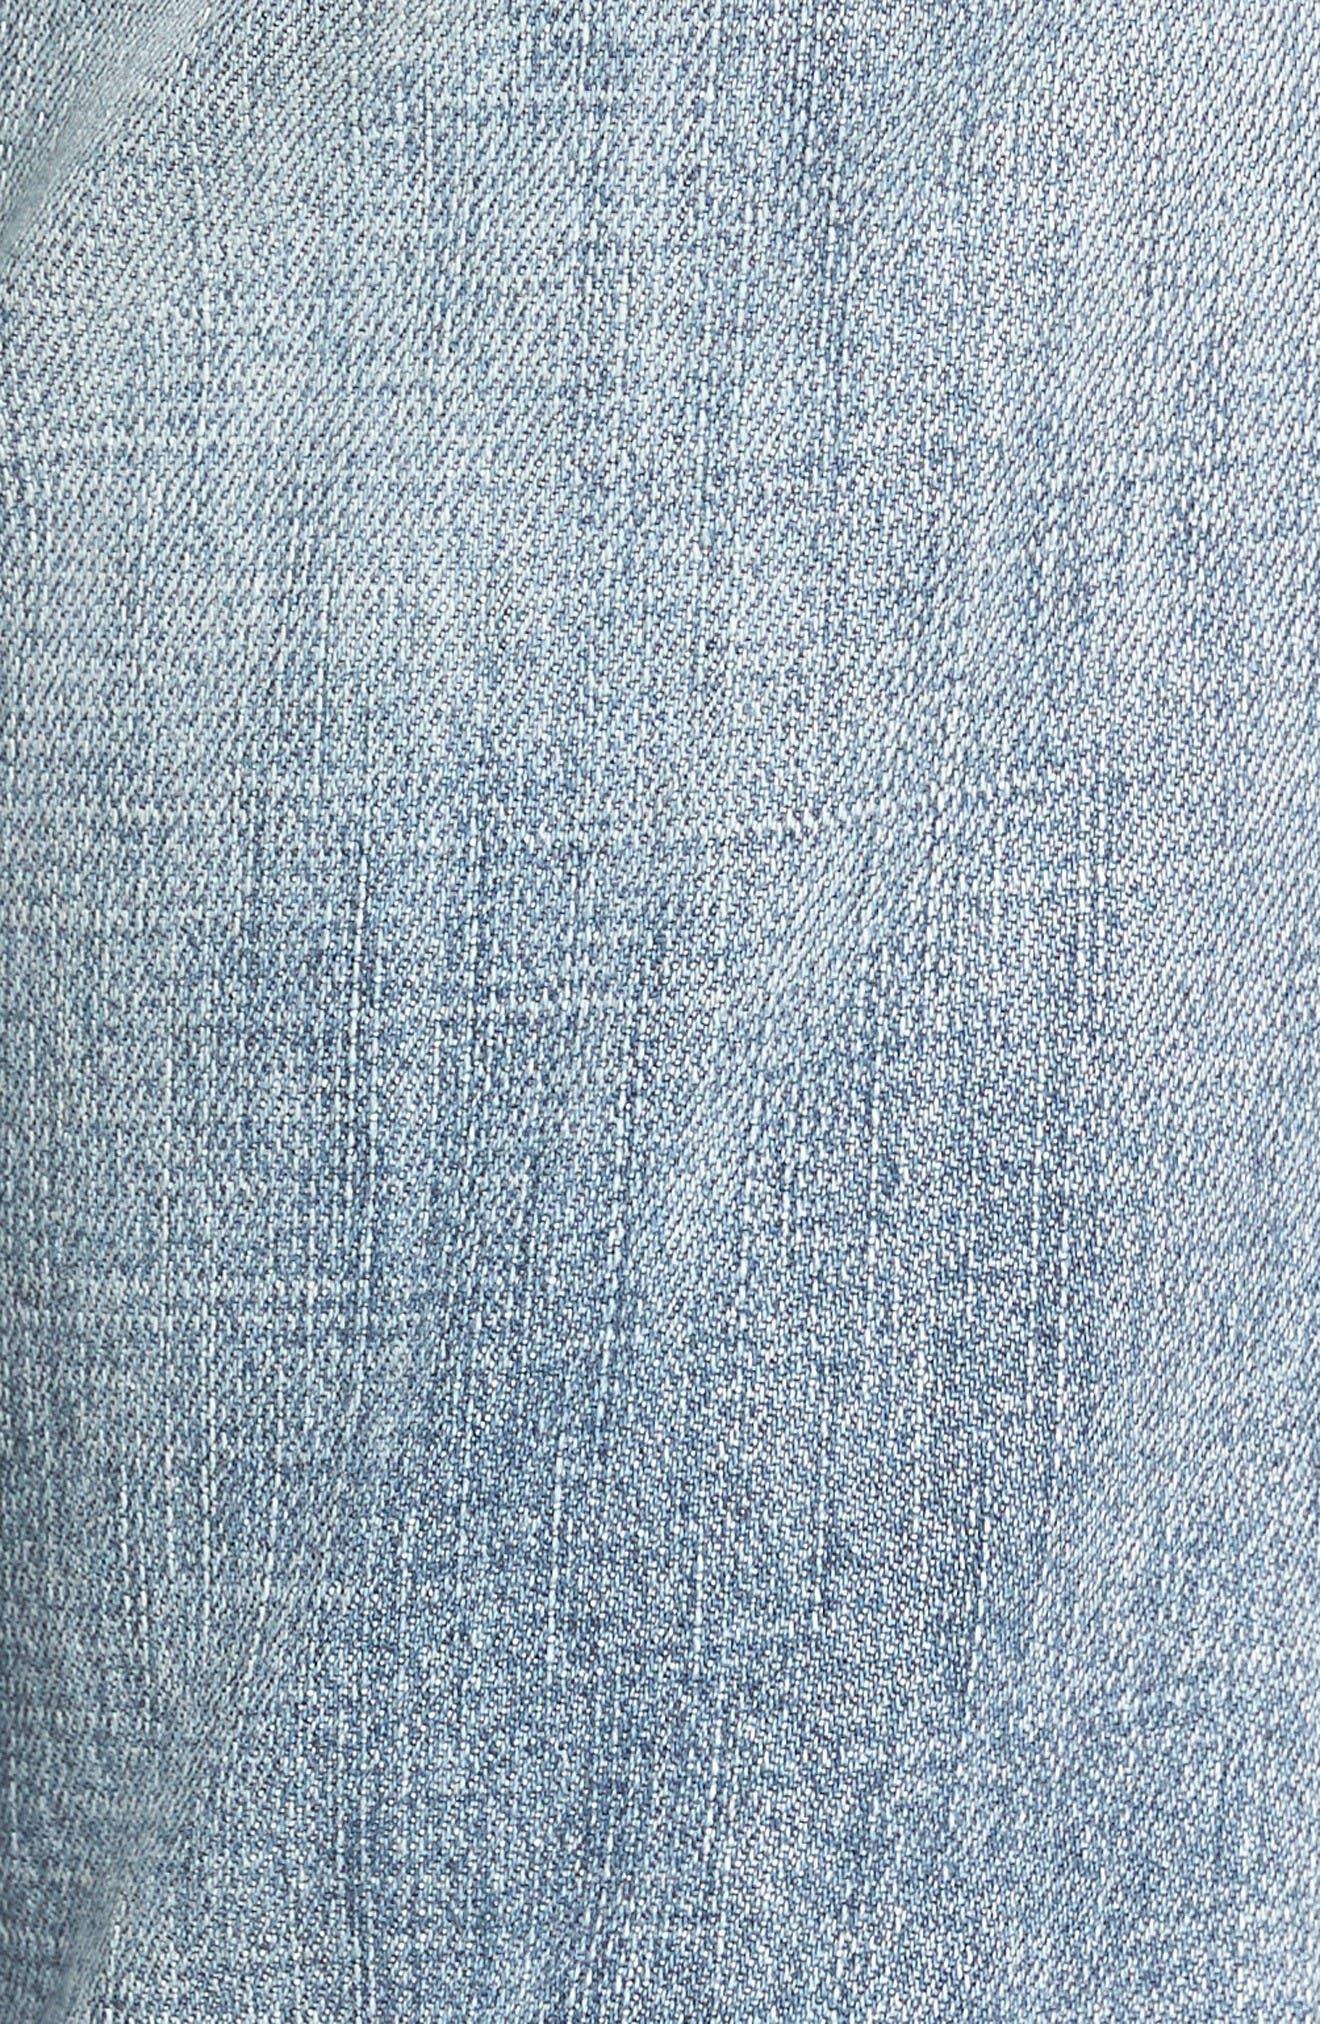 Alternate Image 5  - KUT from the Kloth Catherine Distressed Frayed Hem Boyfriend Jeans (Heartiness)